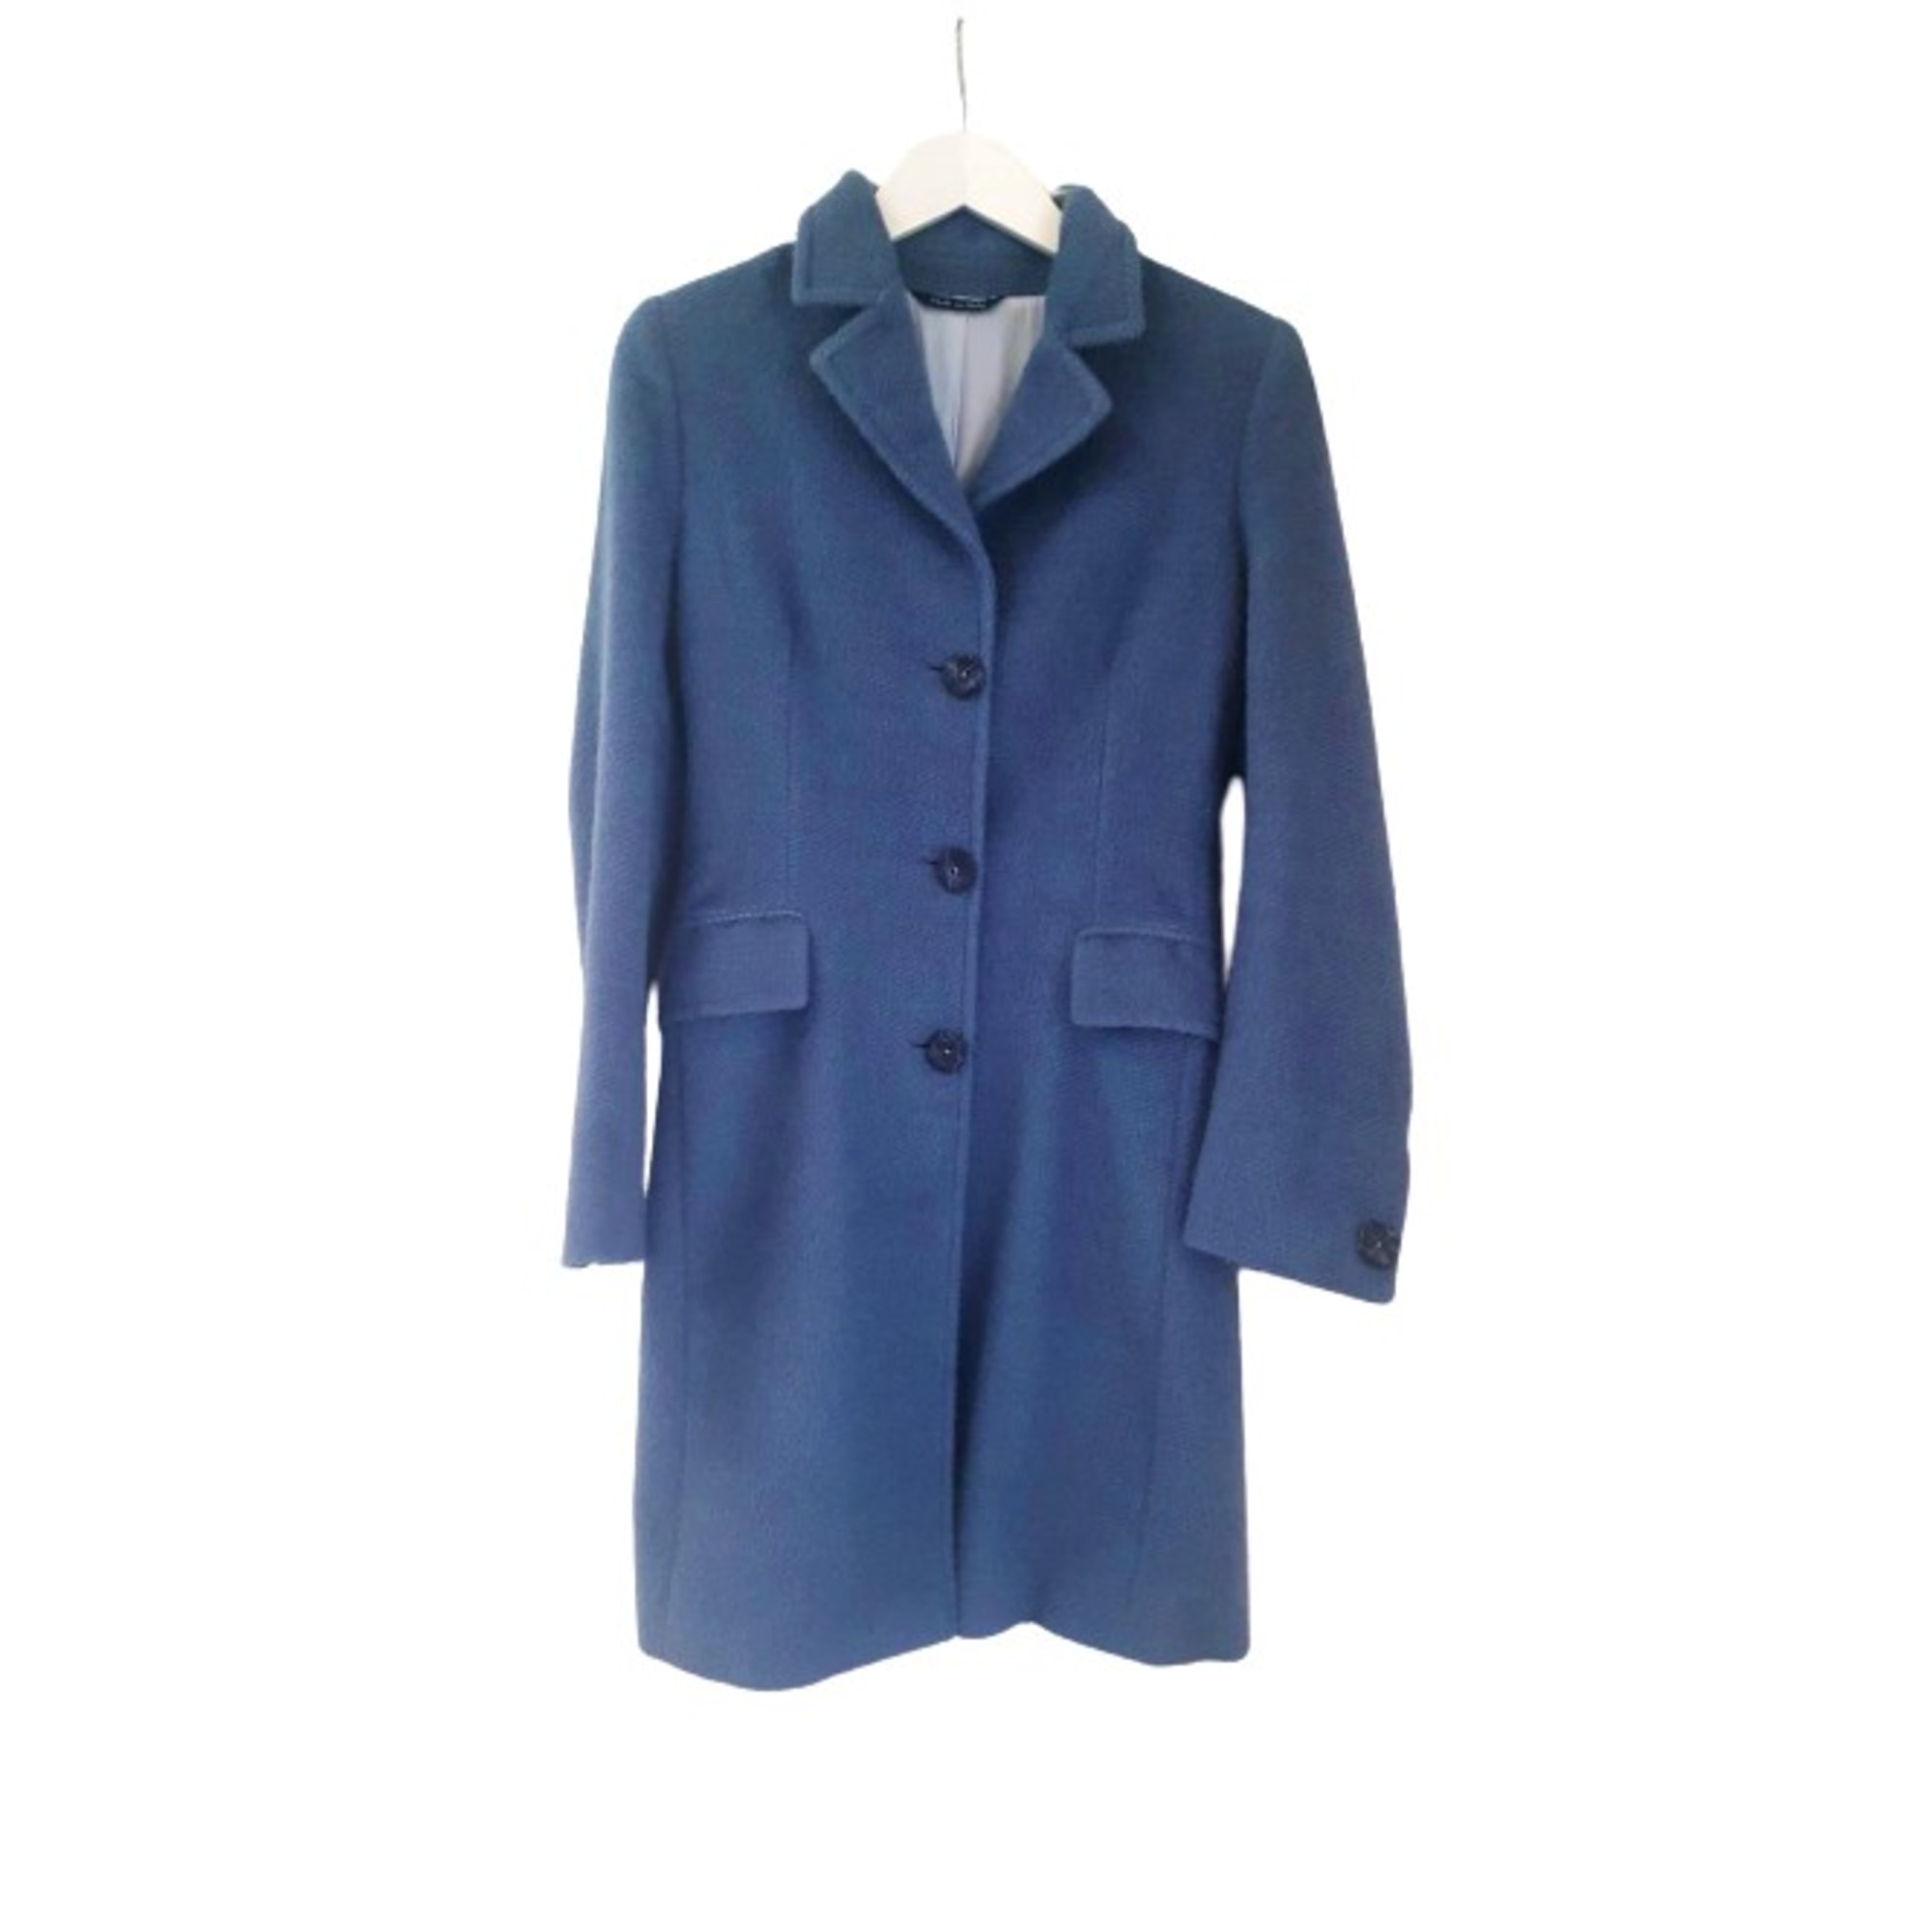 Manteau MARQUE INCONNUE Bleu, bleu marine, bleu turquoise